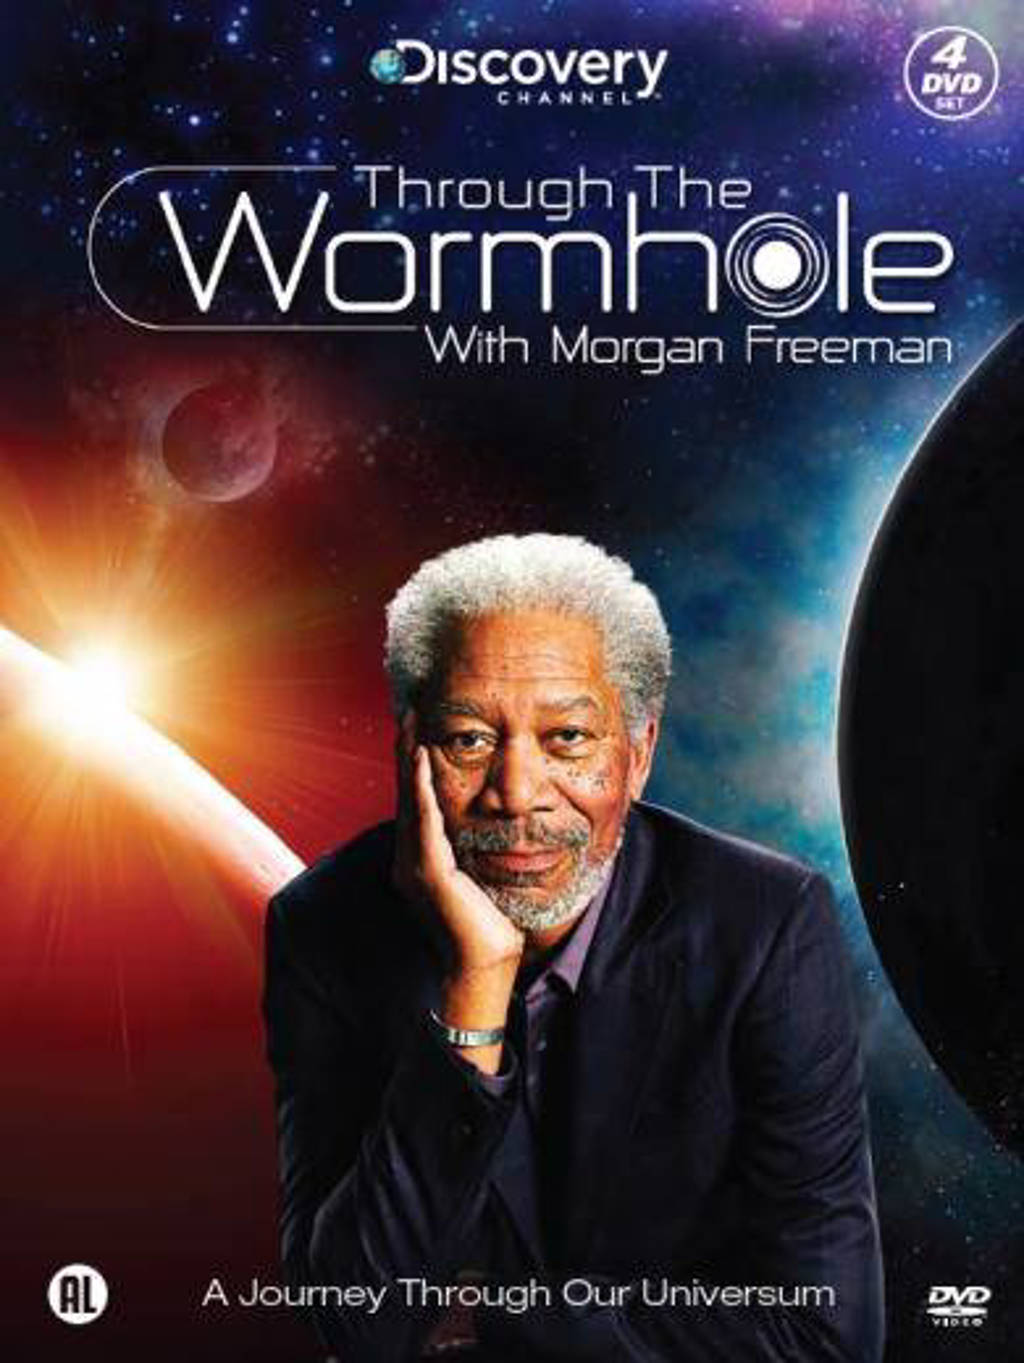 Through the wormhole with Morgan Freeman (DVD)